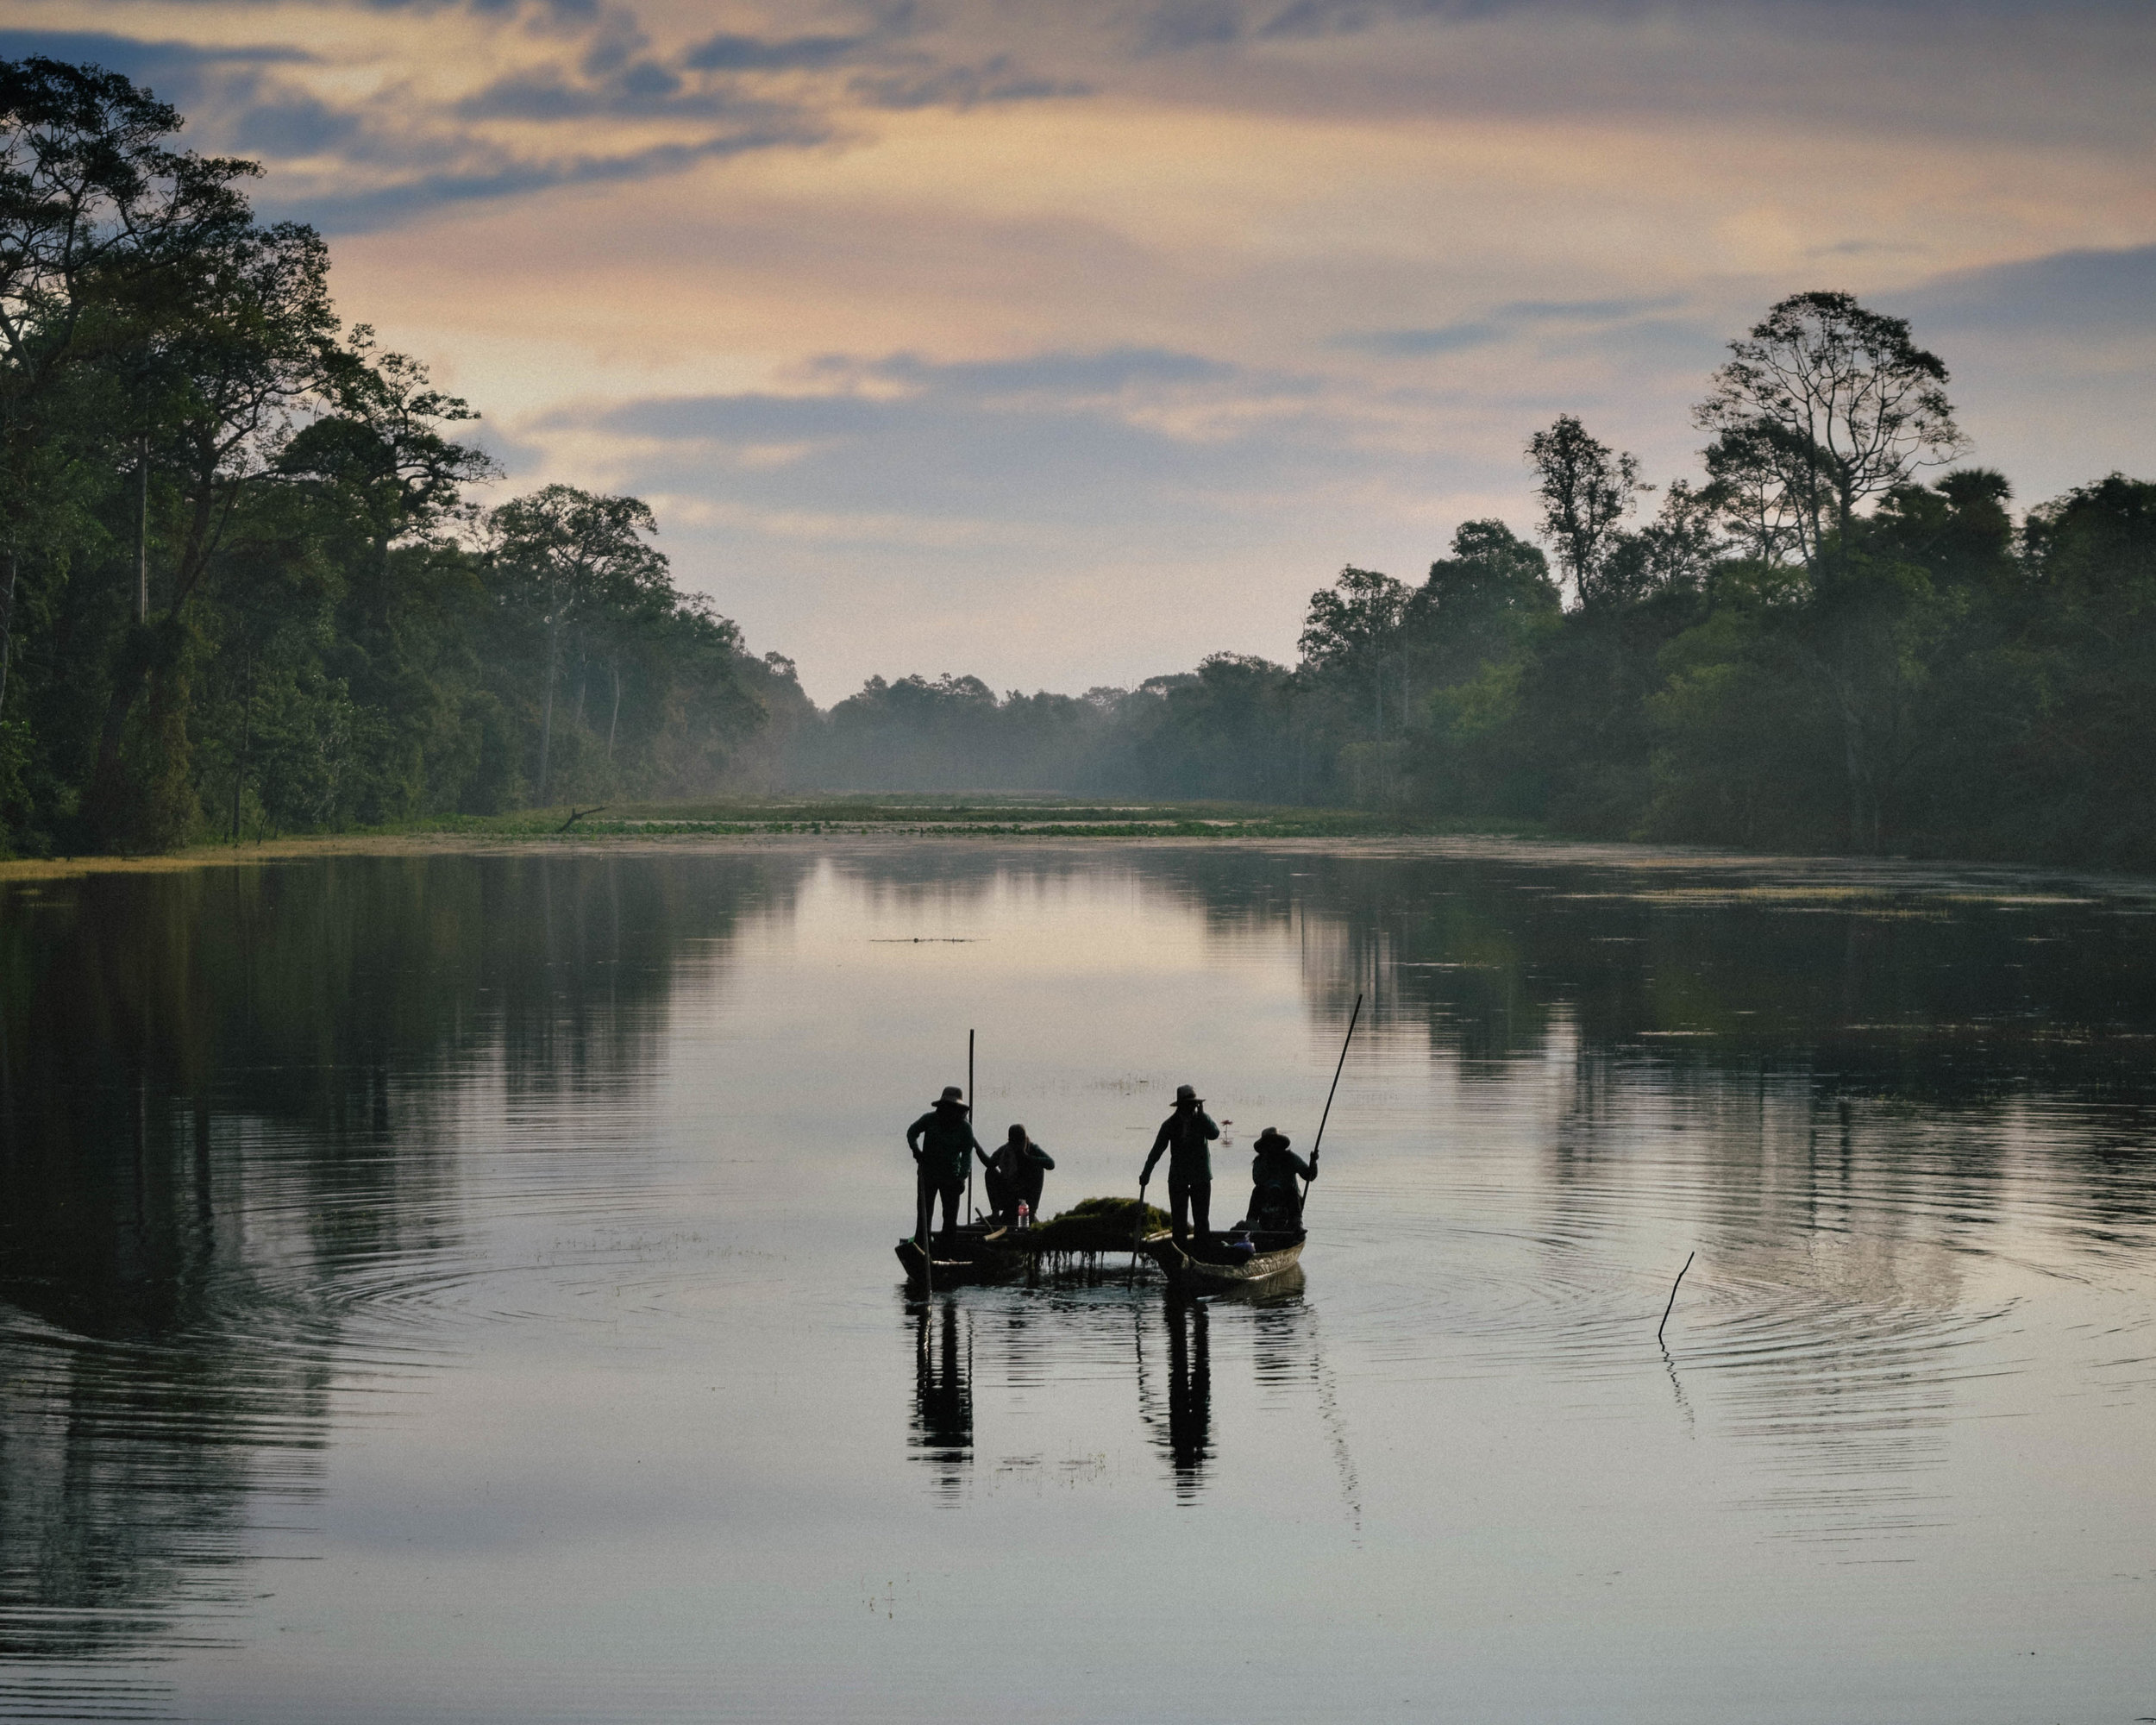 Fisherman at sunrise in Angkor Wat, Cambodia